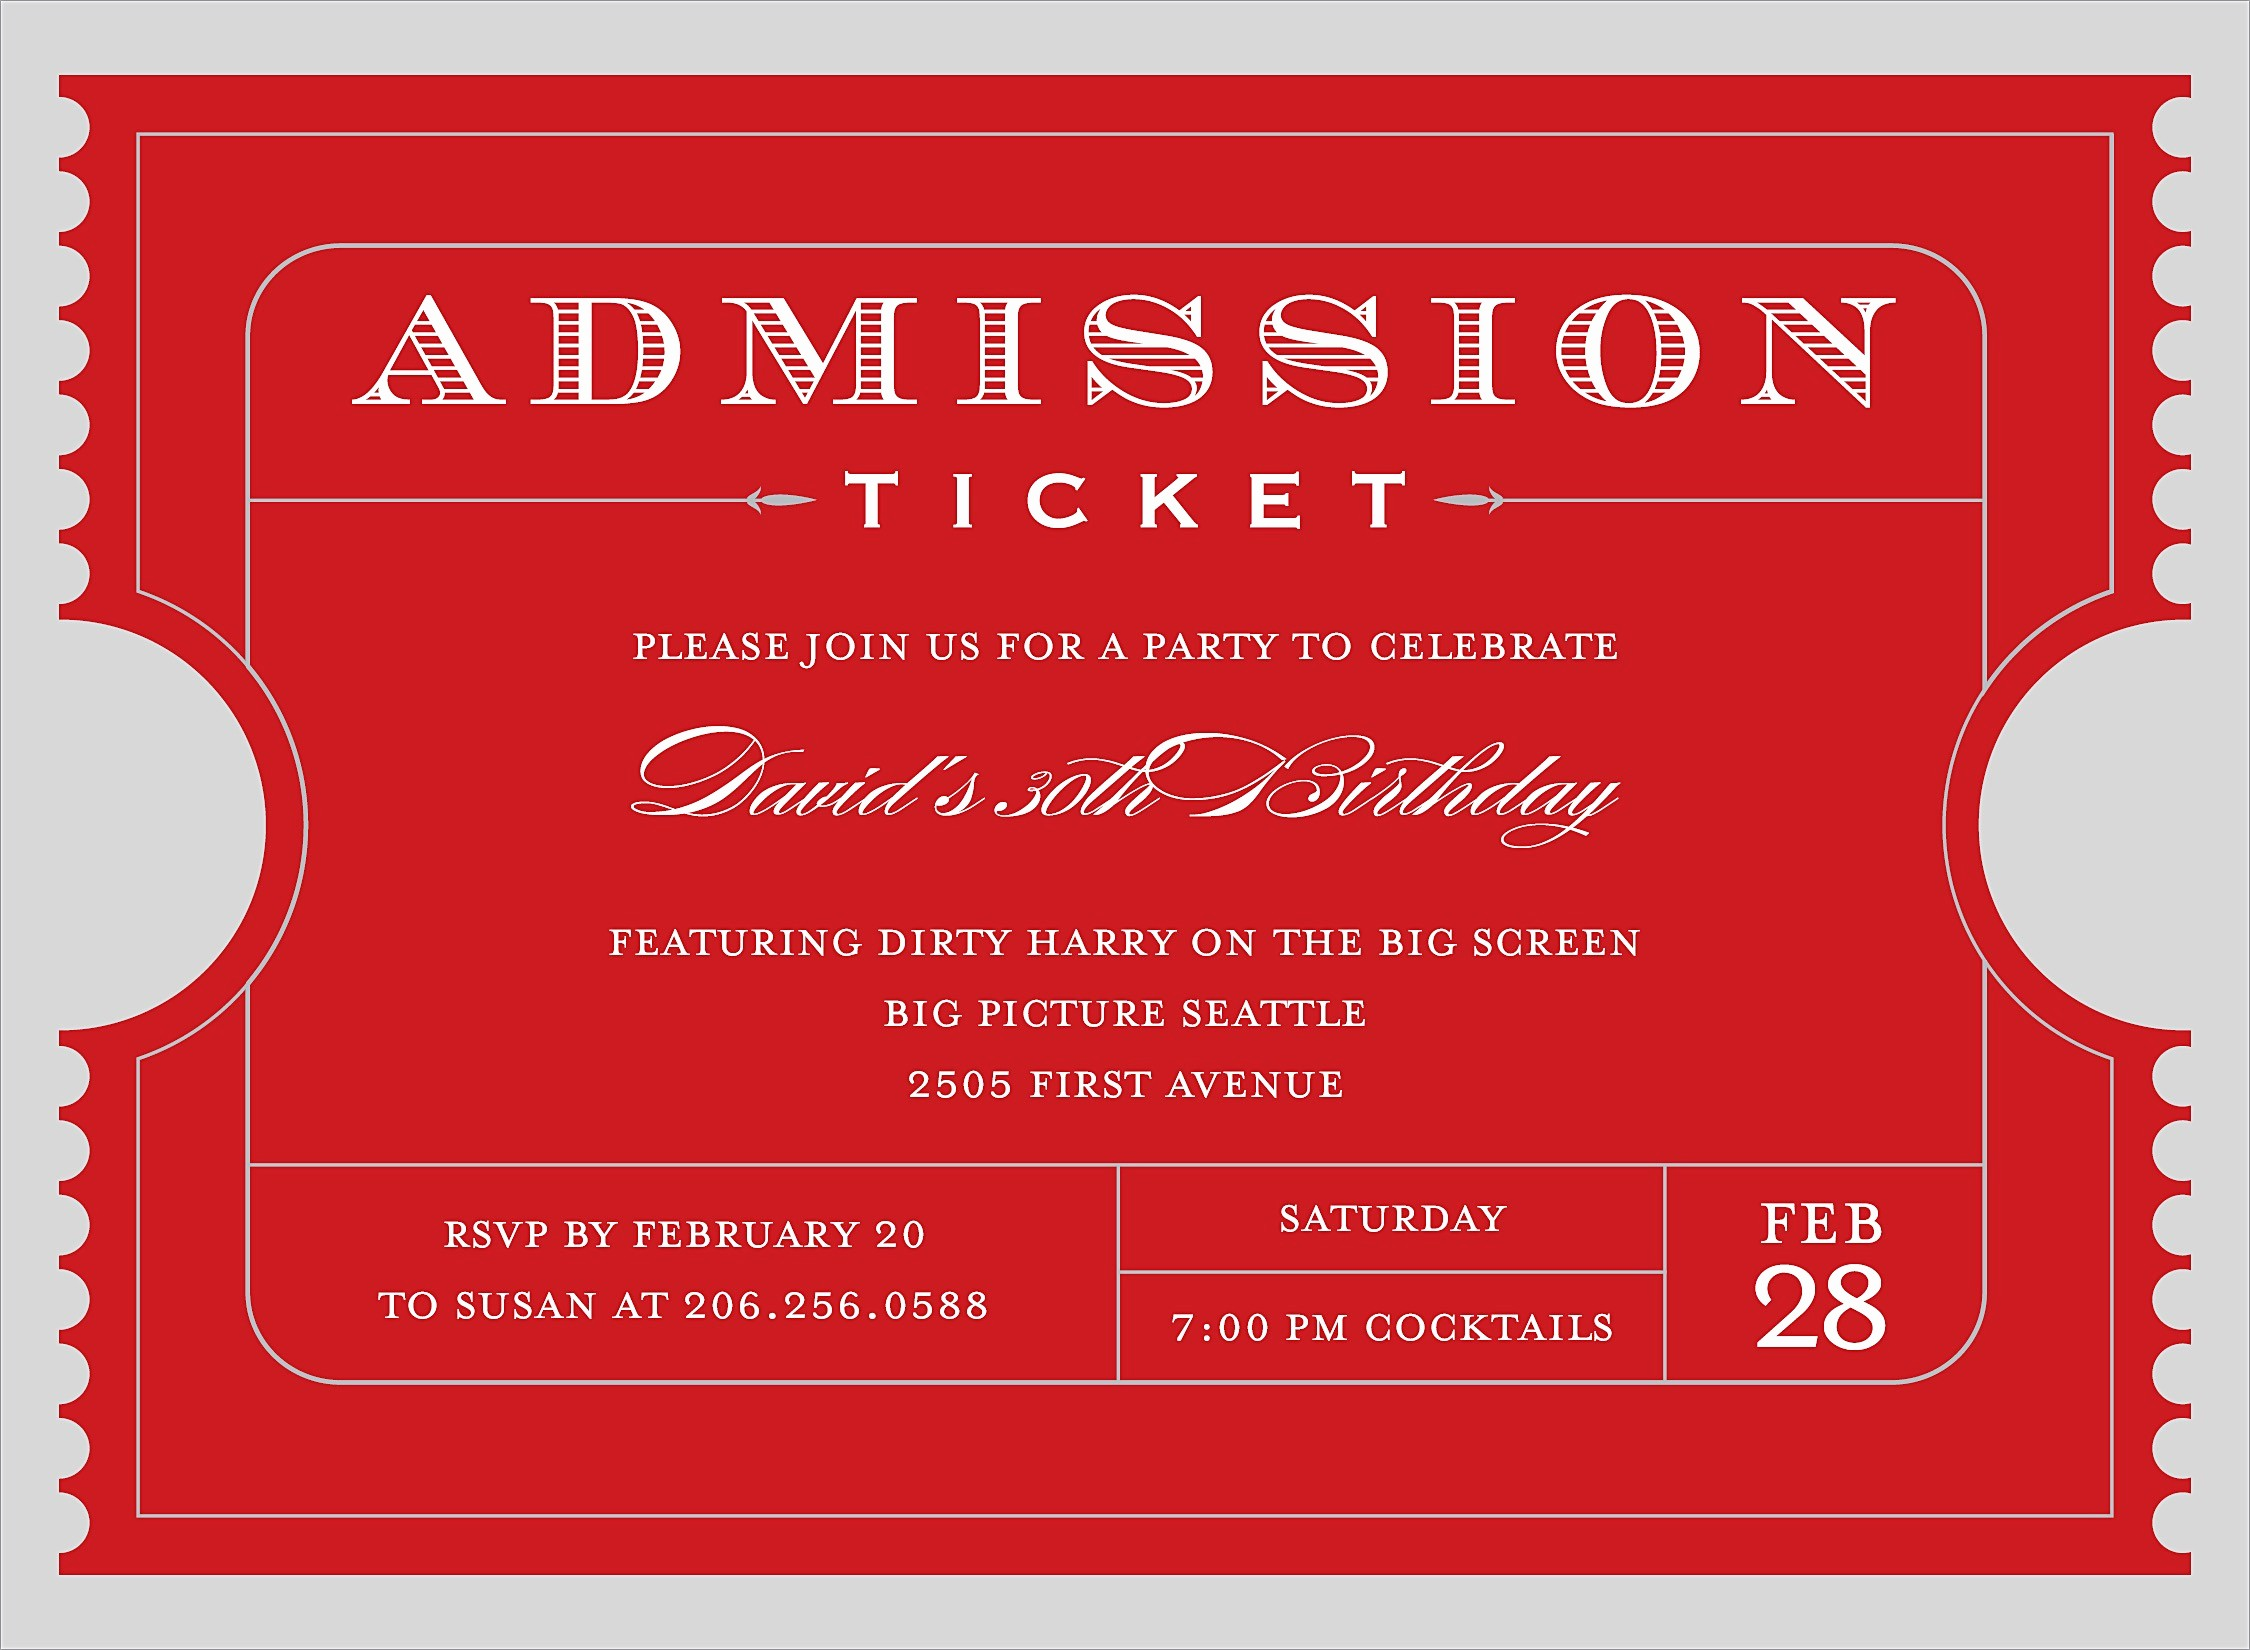 Admit One Ticket Invitation Template Fresh Printable Ticket Invitations Portablegasgrillweber